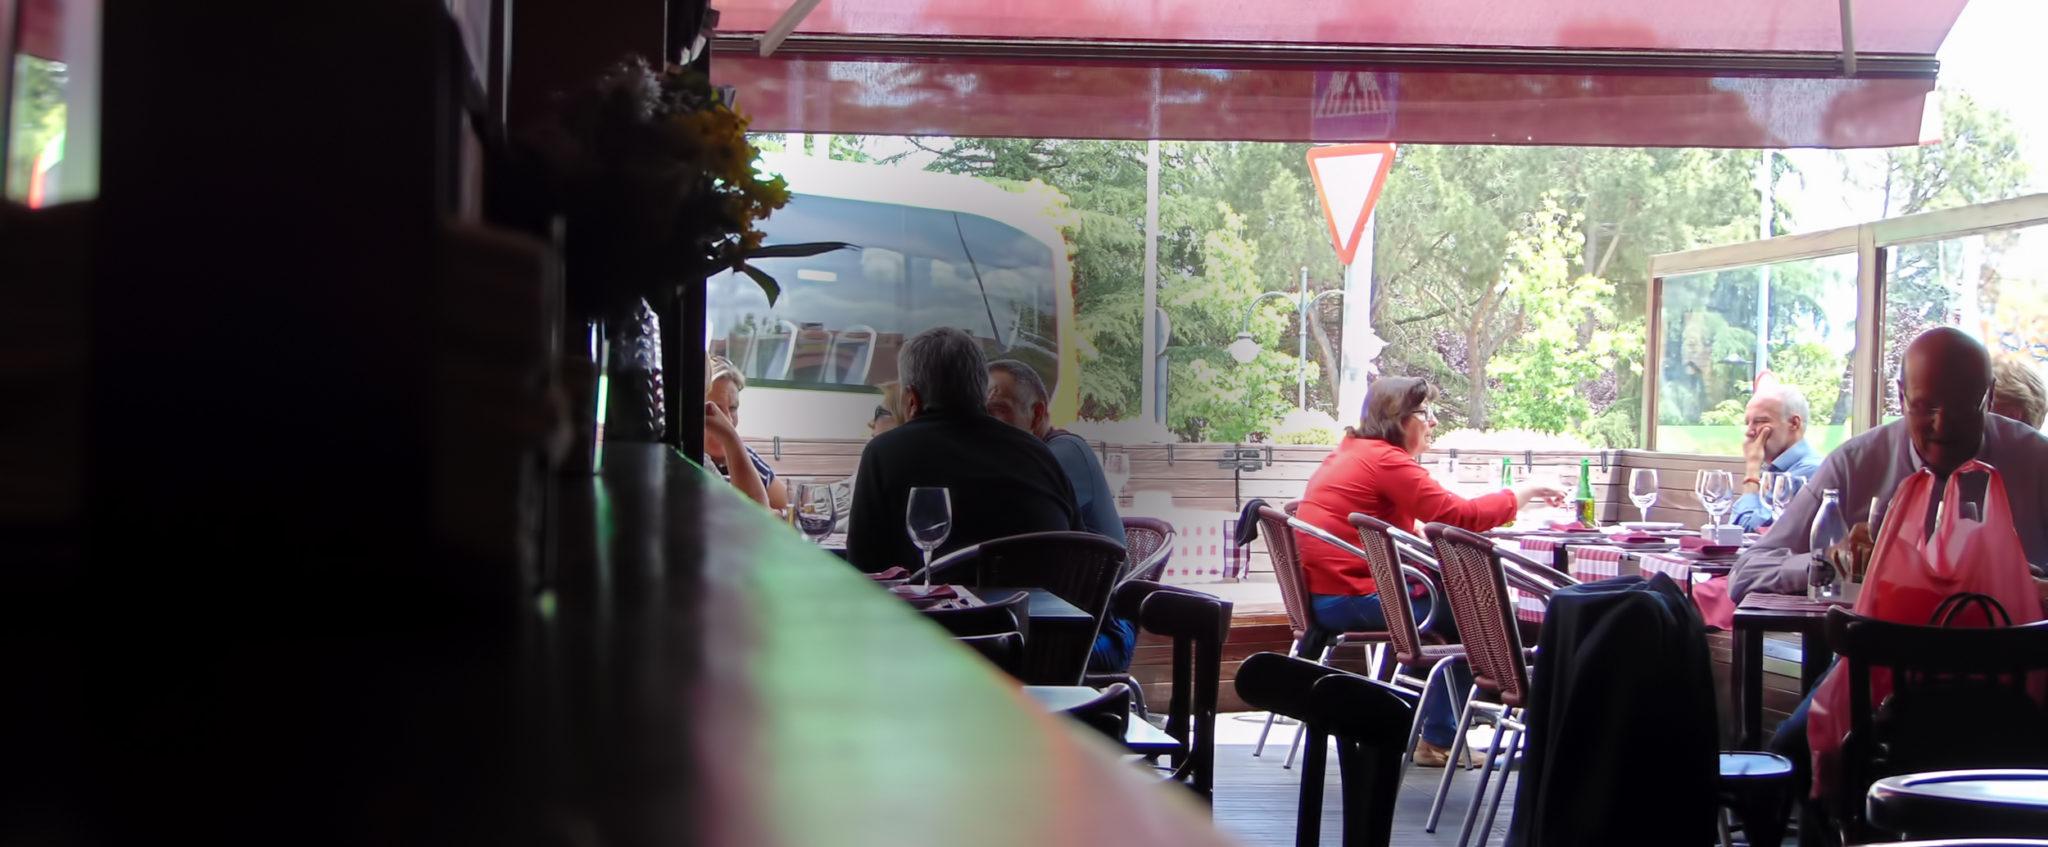 Restaurante La Renta en majadahonda